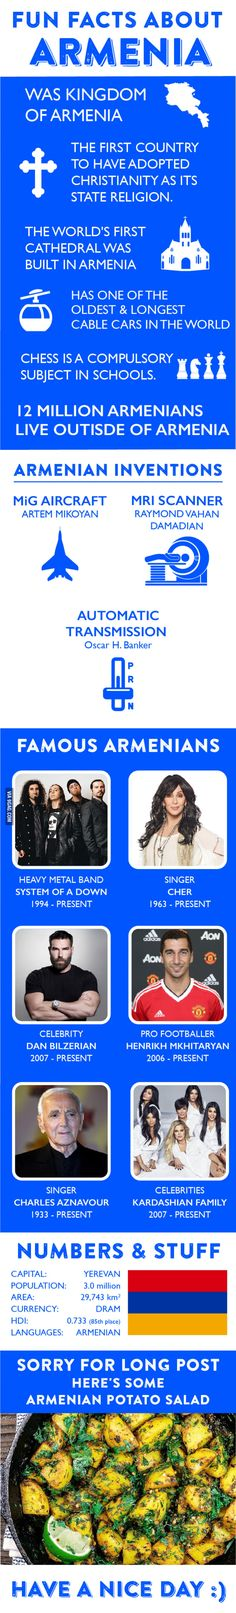 Fun Facts about Armenia